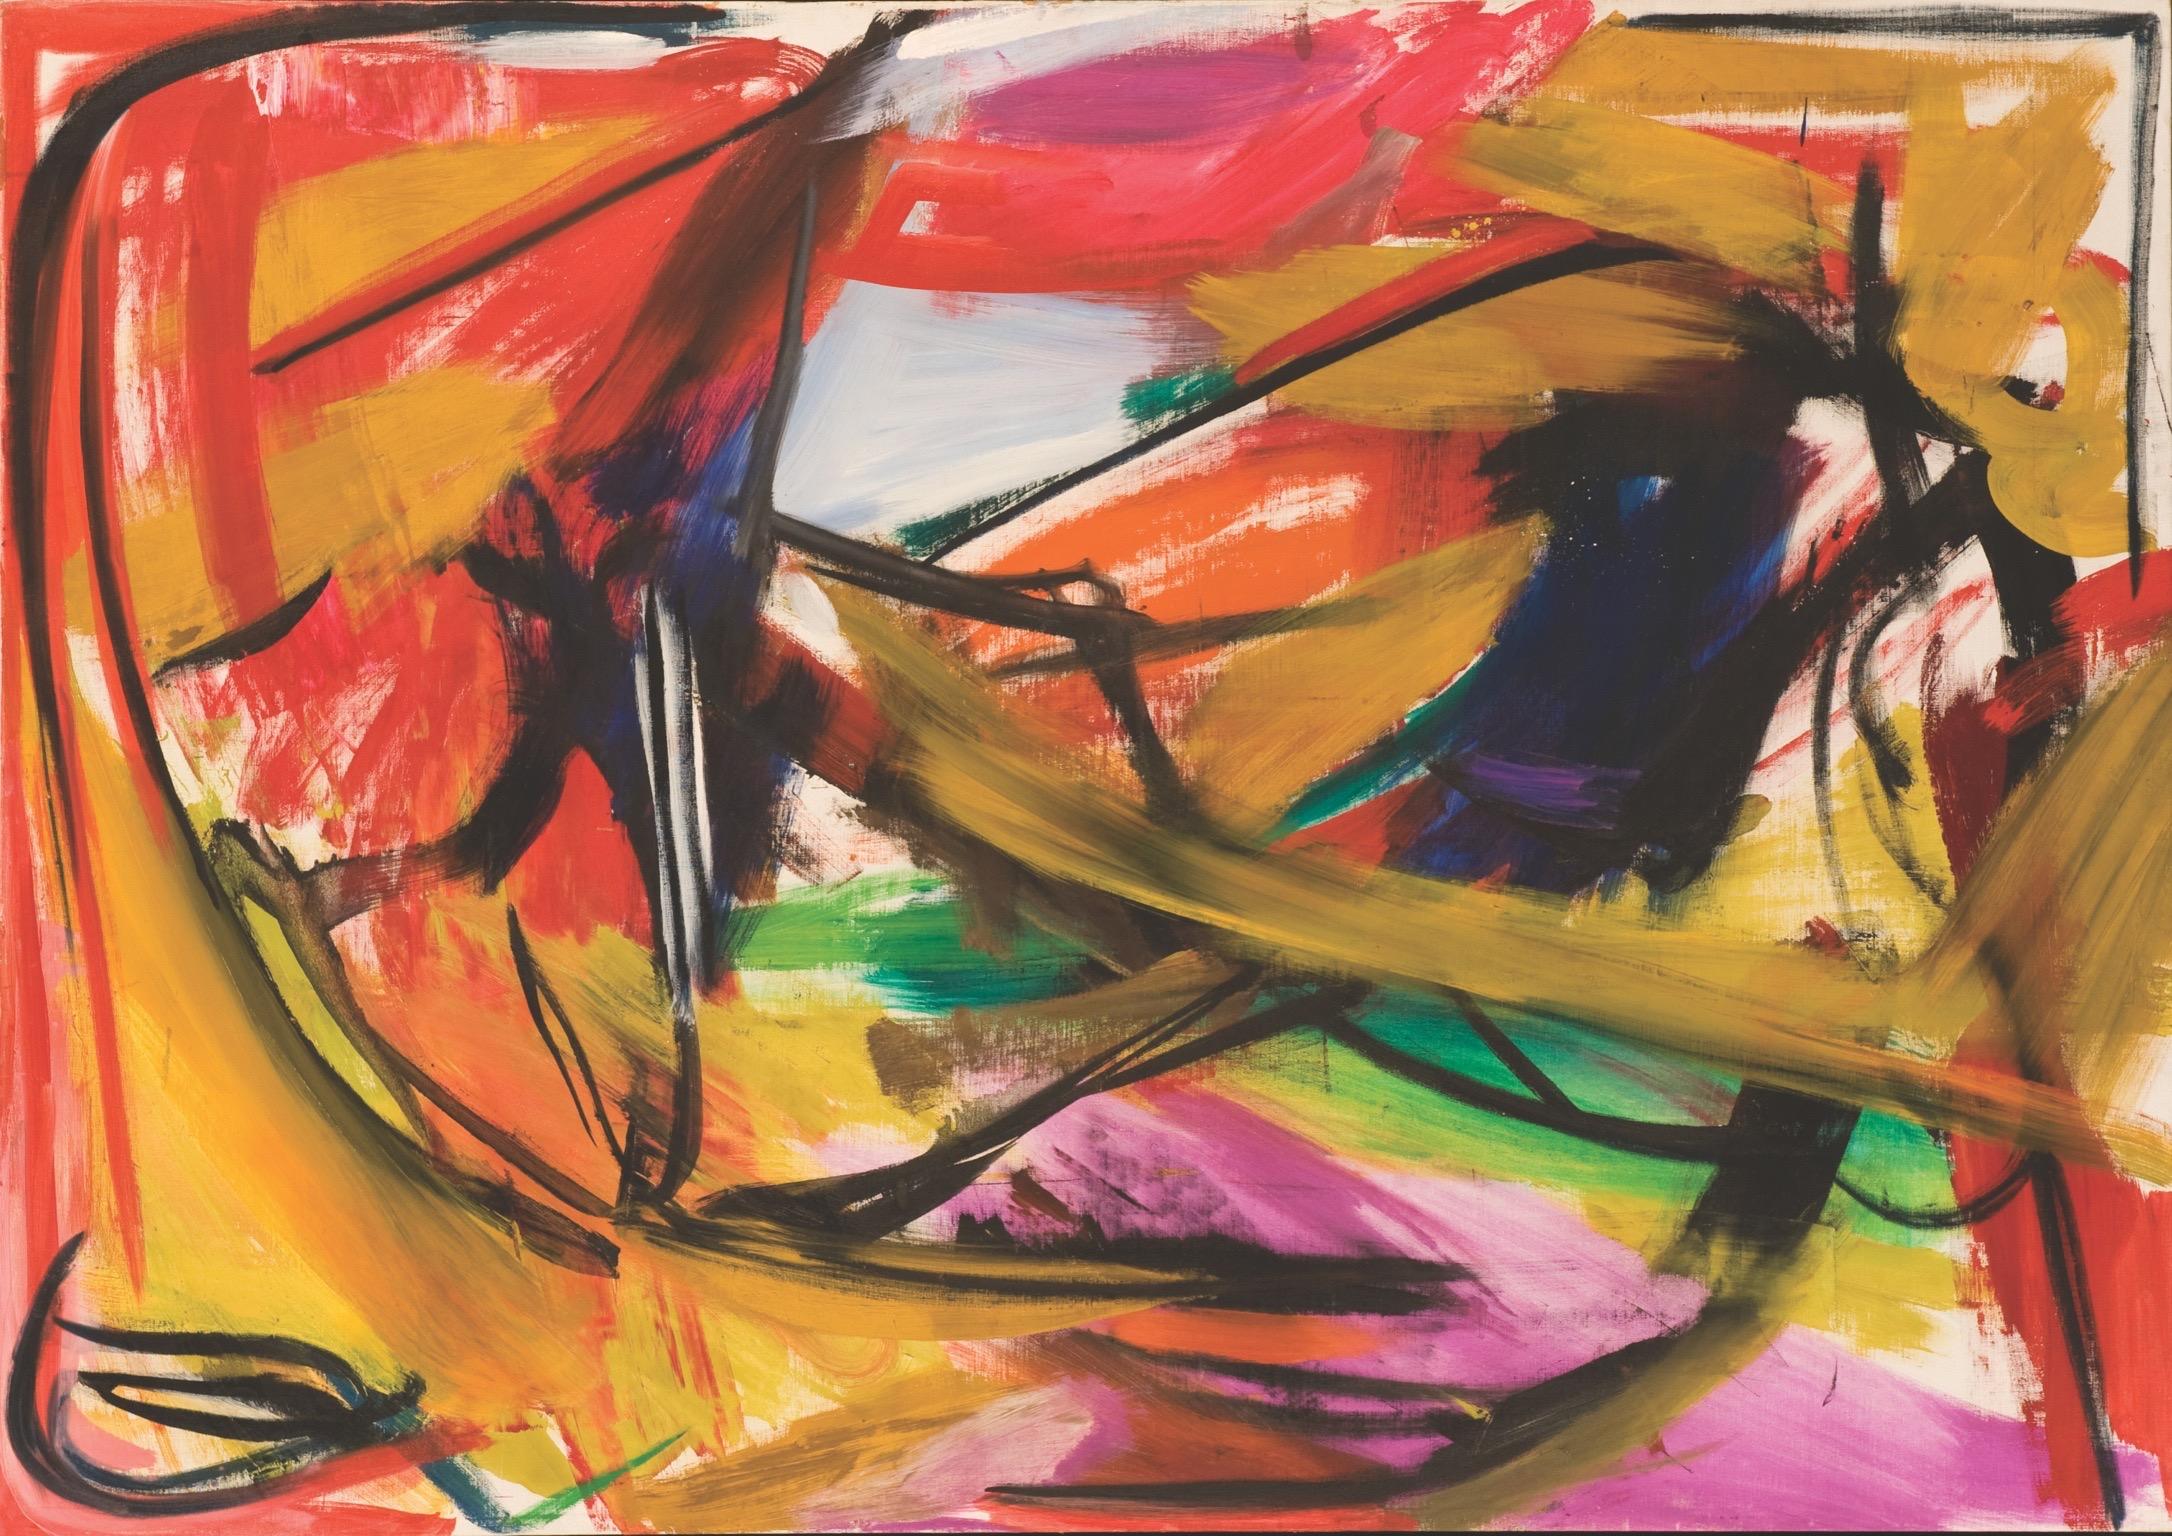 Farol , 1958, oil on canvas, 54 x 77 inches, Mint Museum-Charlotte, North Carolina